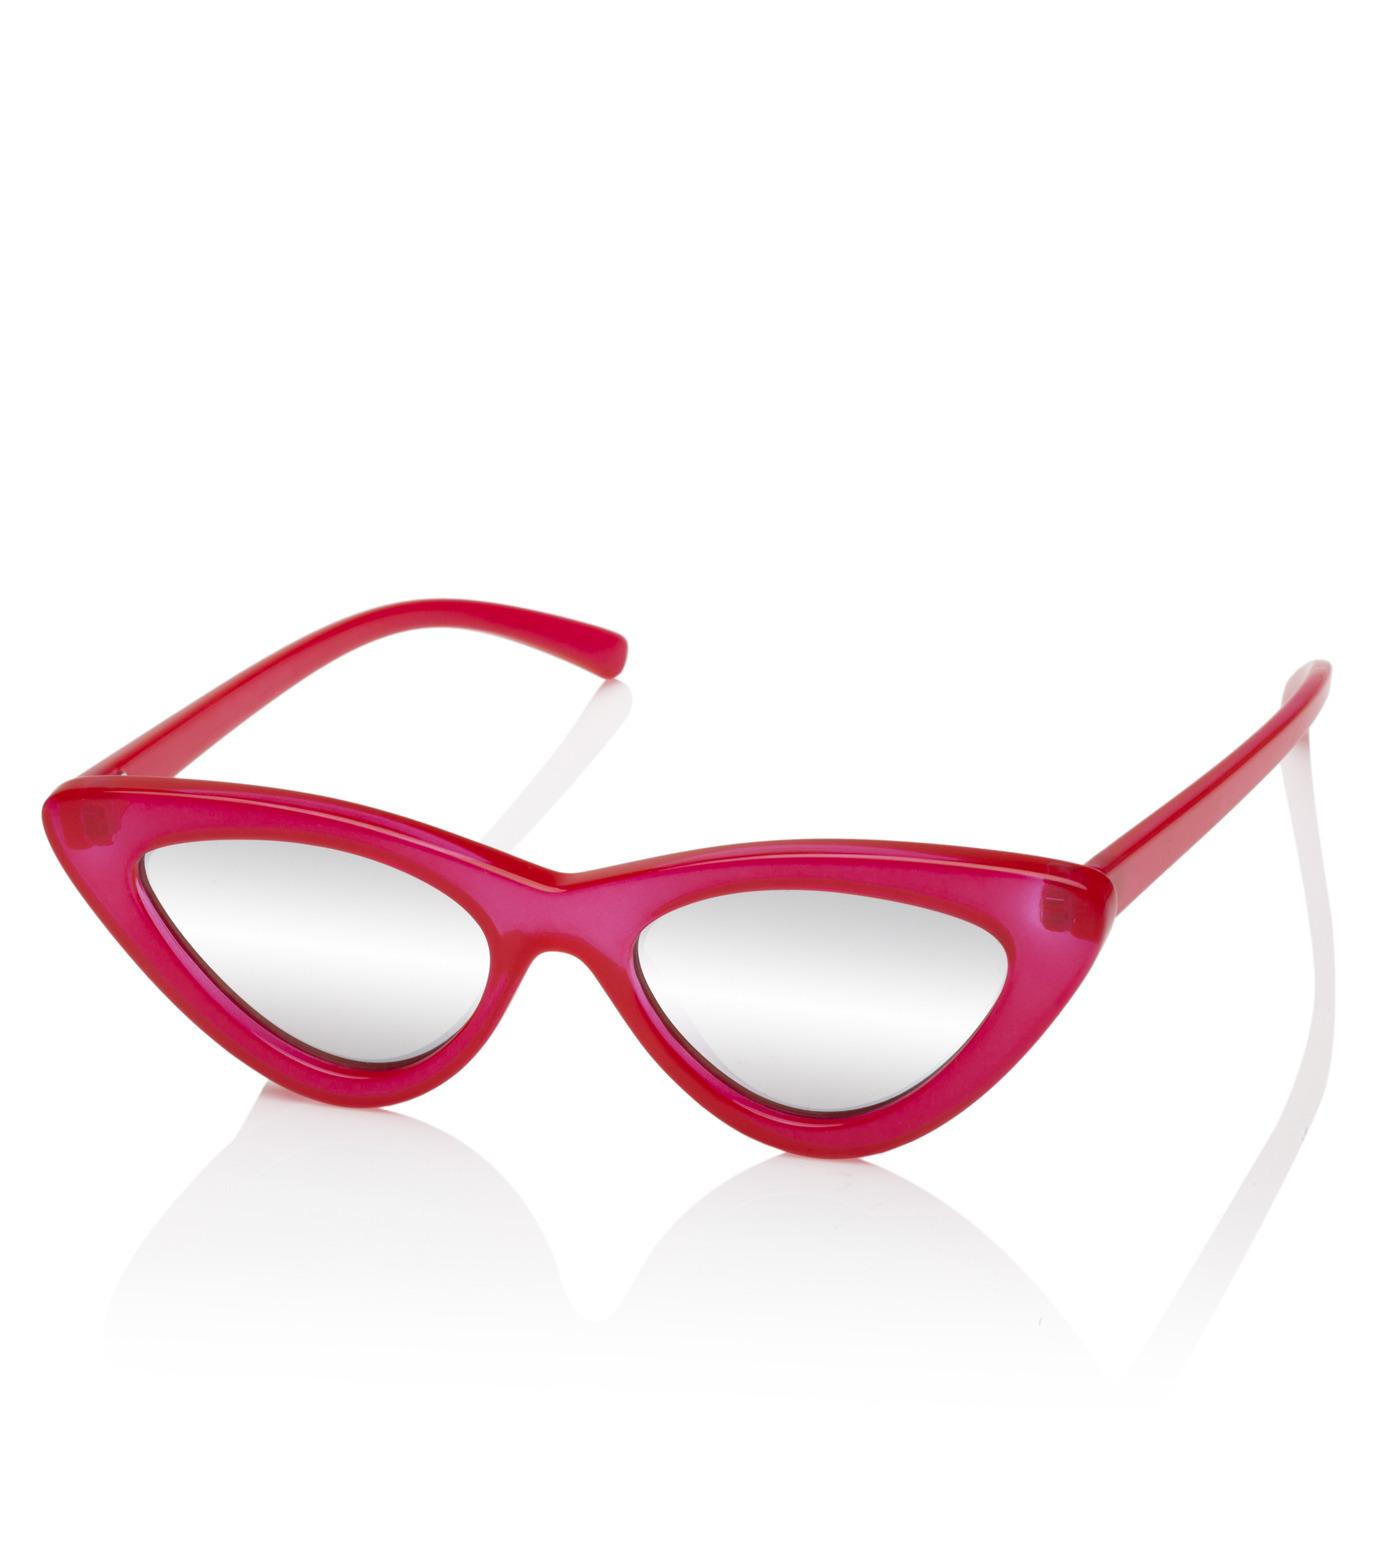 Adam Selman×Le Specs(アダム・セルマン×ル・スペックス)のThe Last Lotita -Opaque Red / Silver Mirror--RED(アイウェア/eyewear)-1502112-62 拡大詳細画像1